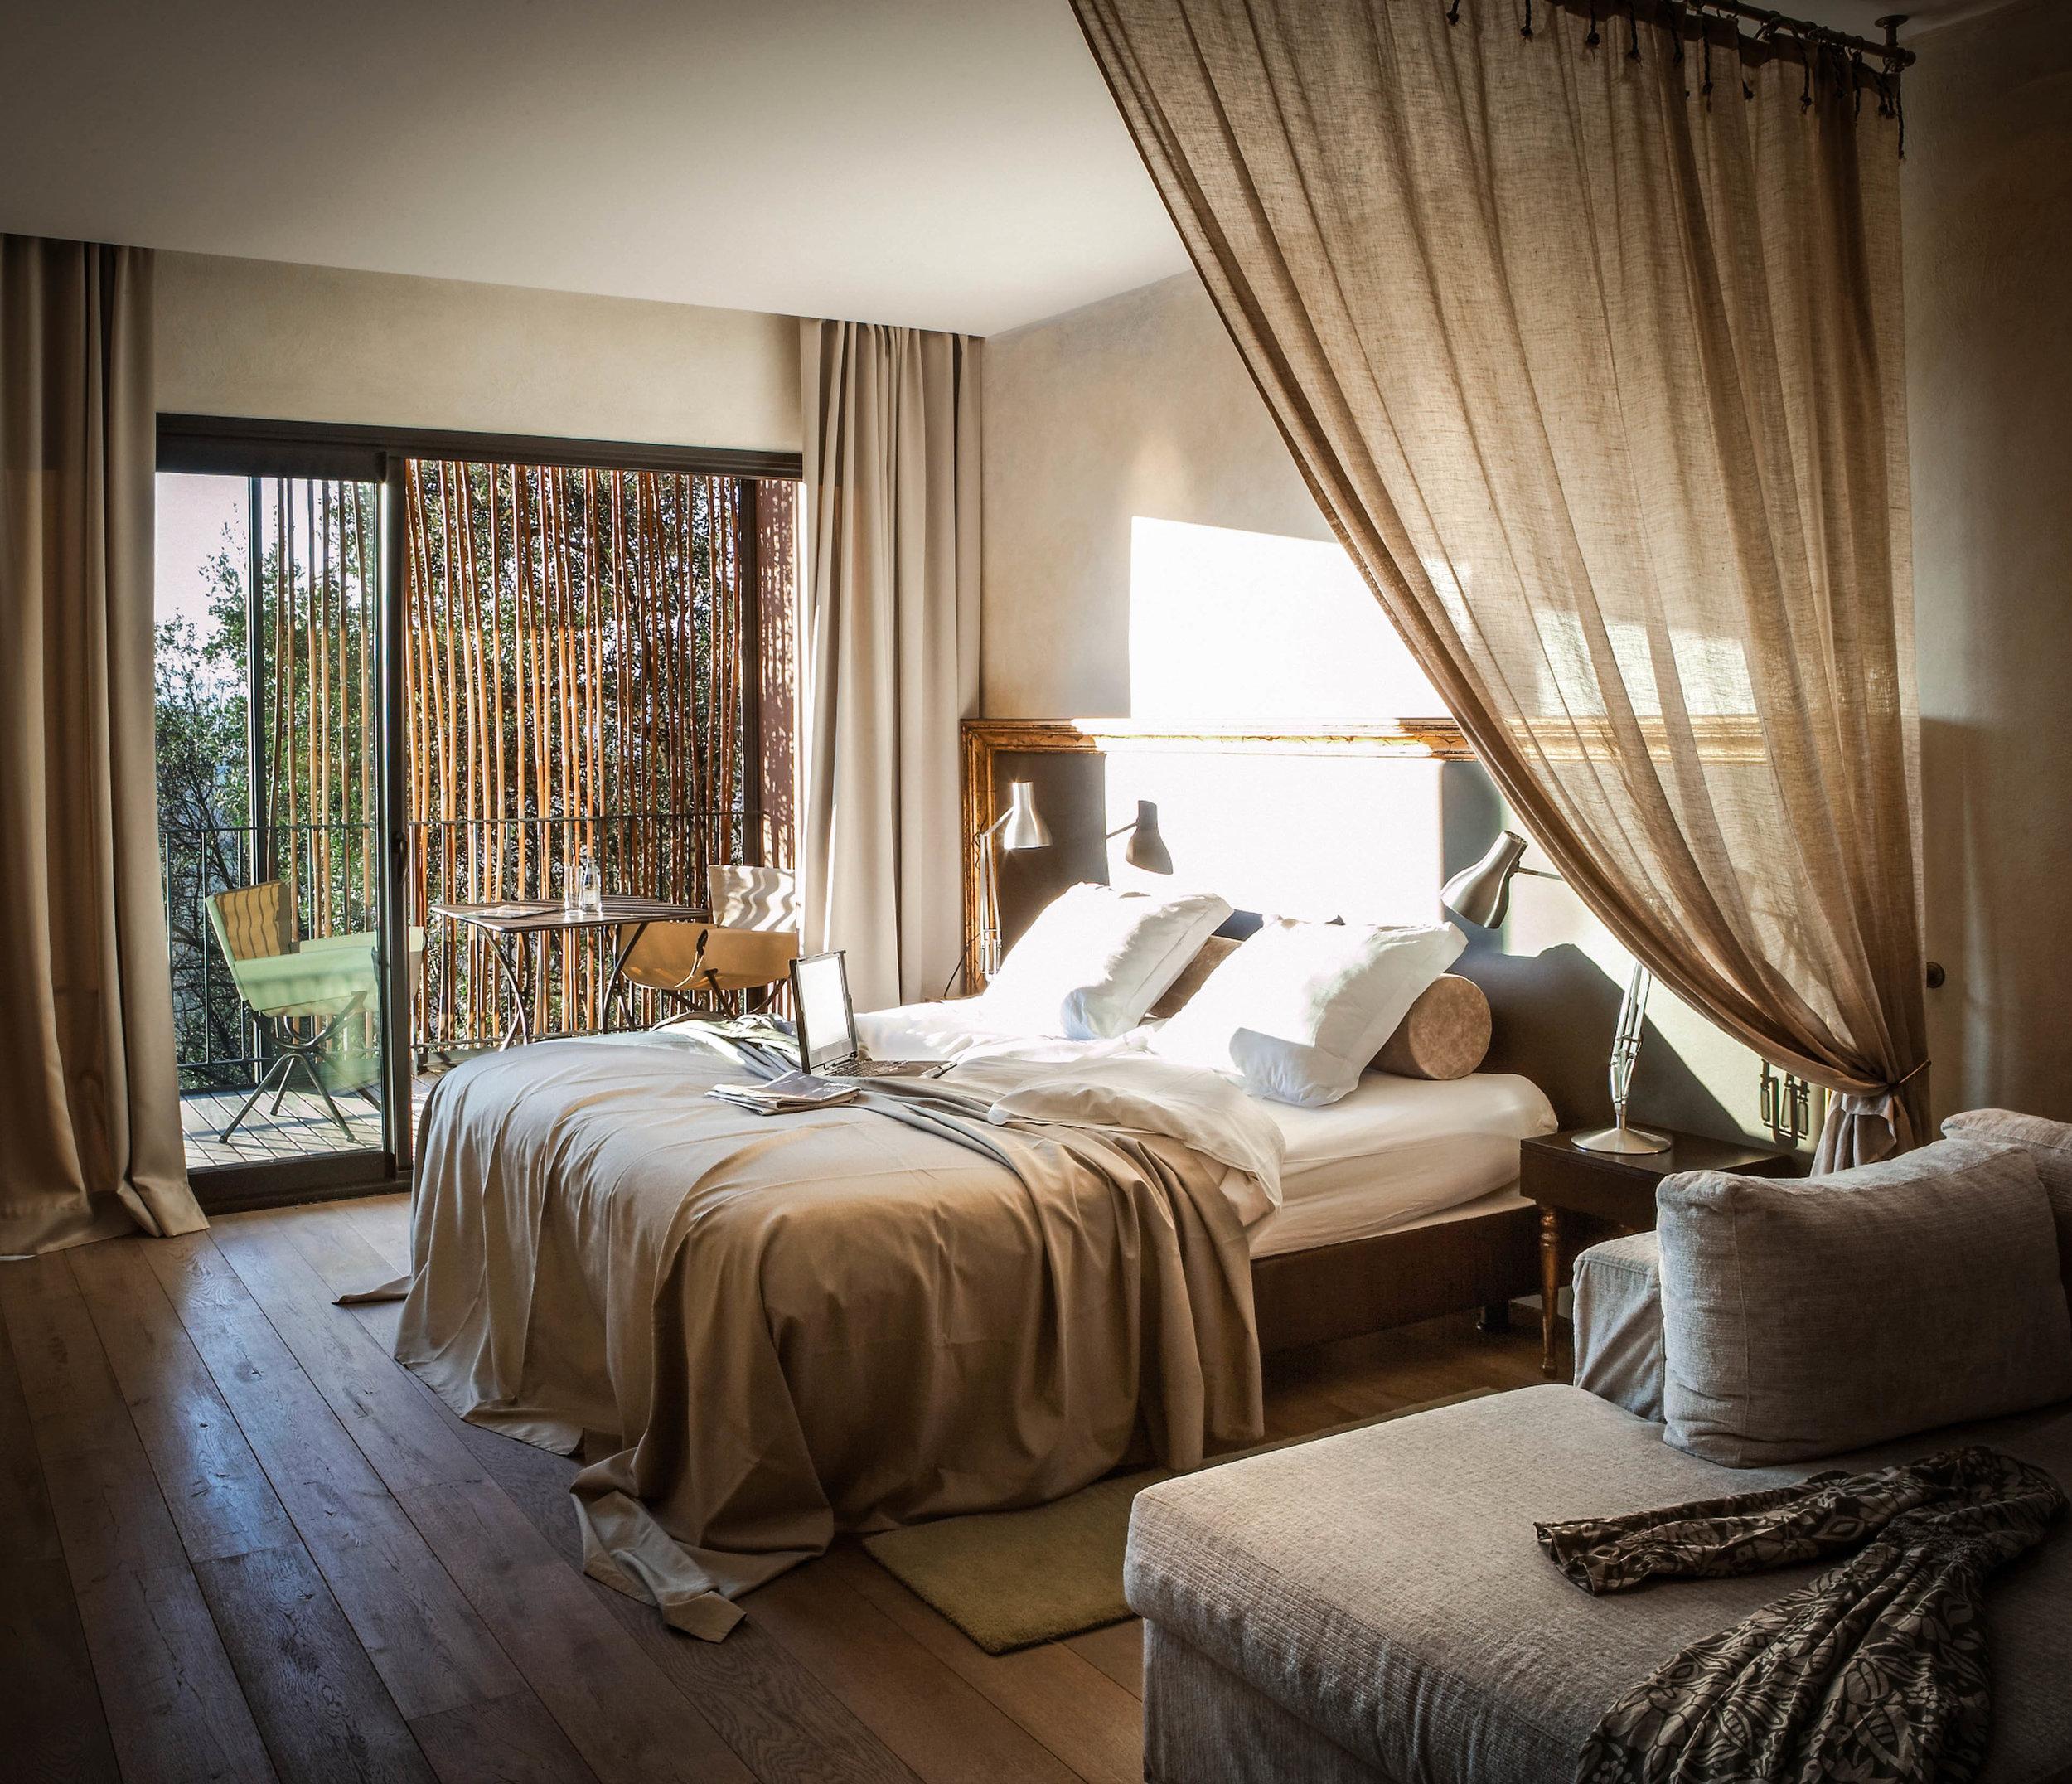 Kamer - idyllische hotels - Castell d'Emporda - Reizen met kinderen